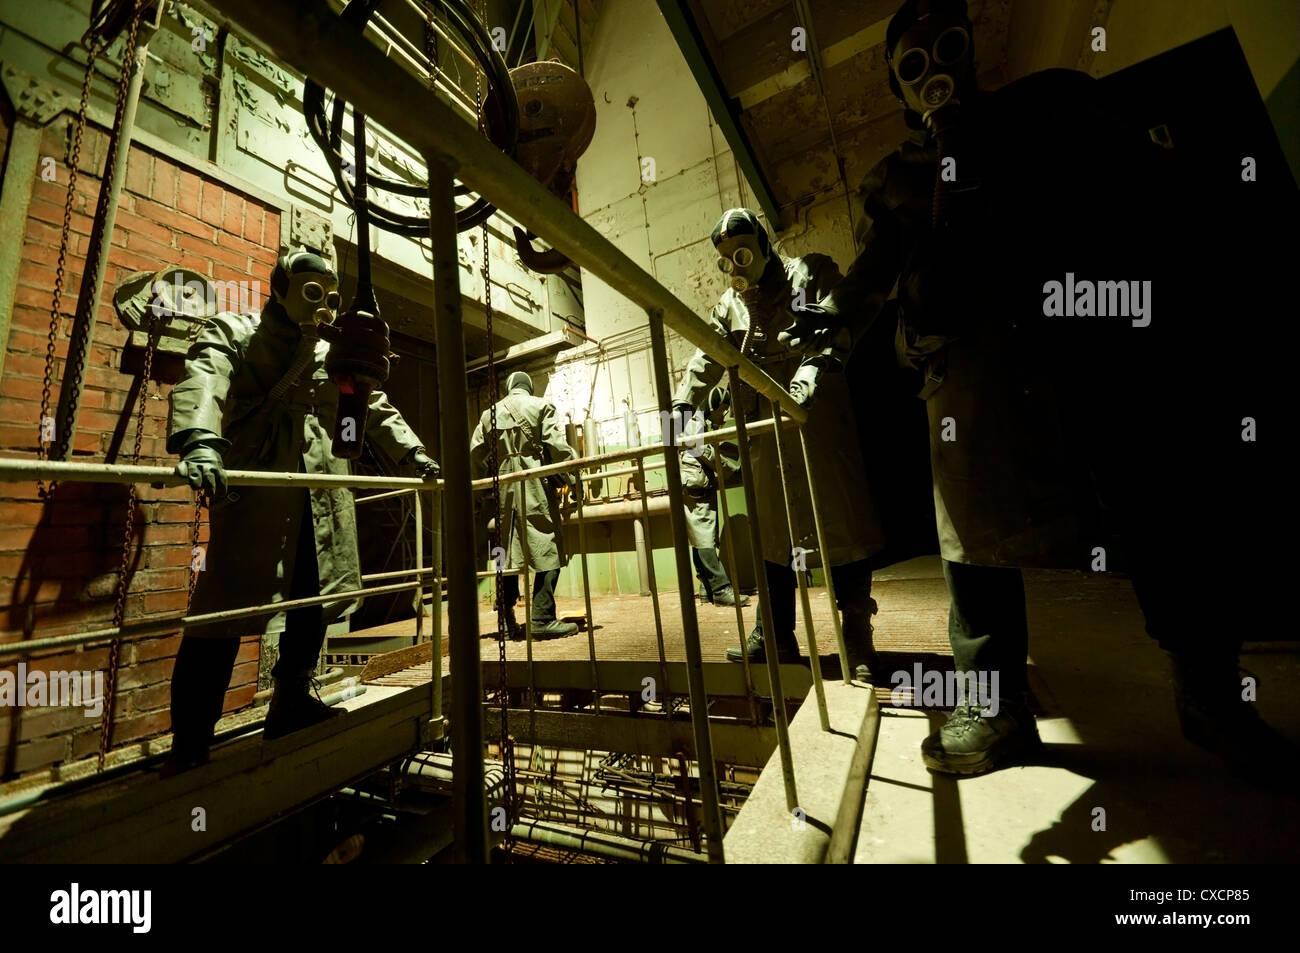 Gas masked menacing men posing in industrial setting - Stock Image